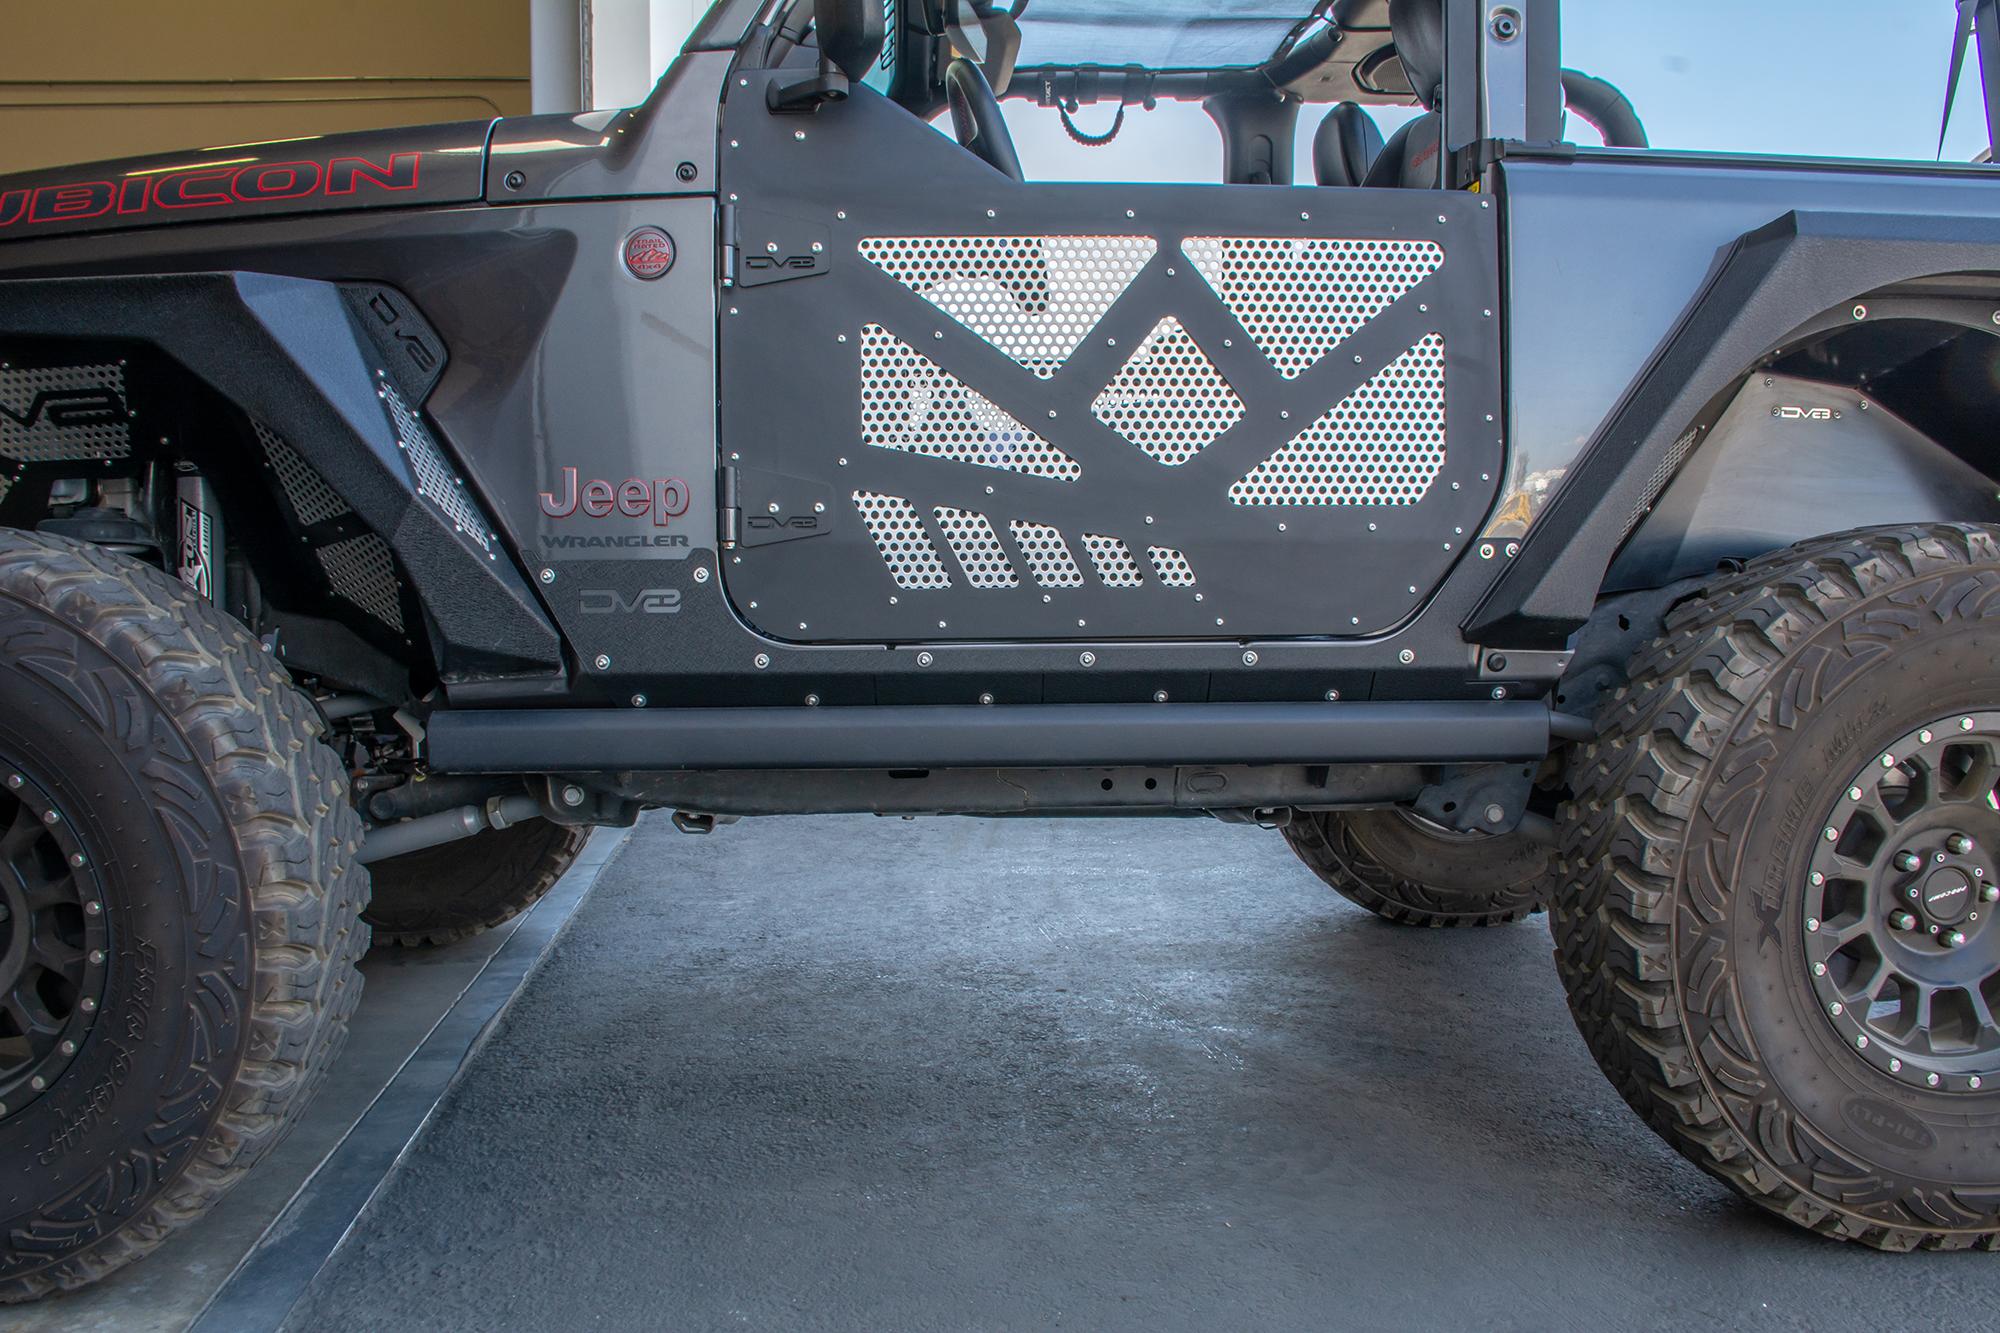 Jeep JL Rock Skins 18-Present Jeep Wrangler JL 2 Door DV8 Offroad